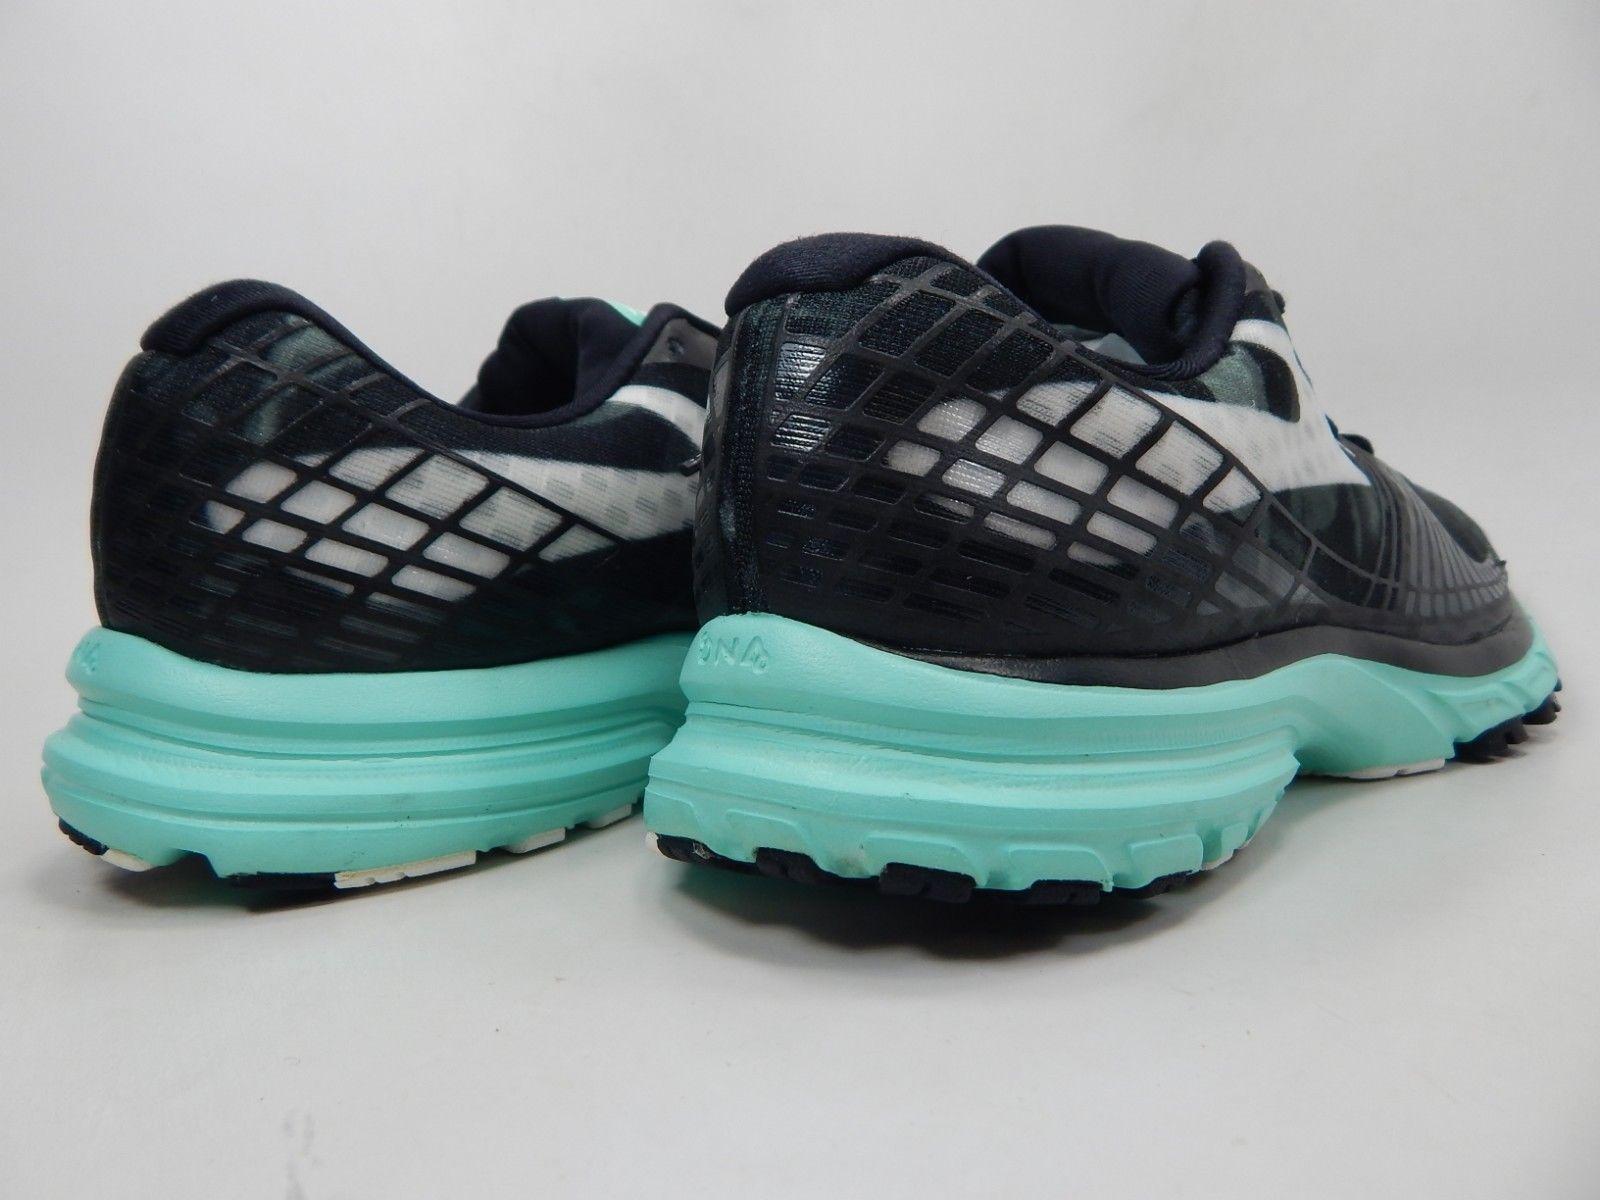 Brooks Launch 3 Size 6.5 M (B) EU 37.5 Women's Running Shoes Black 1202061B071 image 5